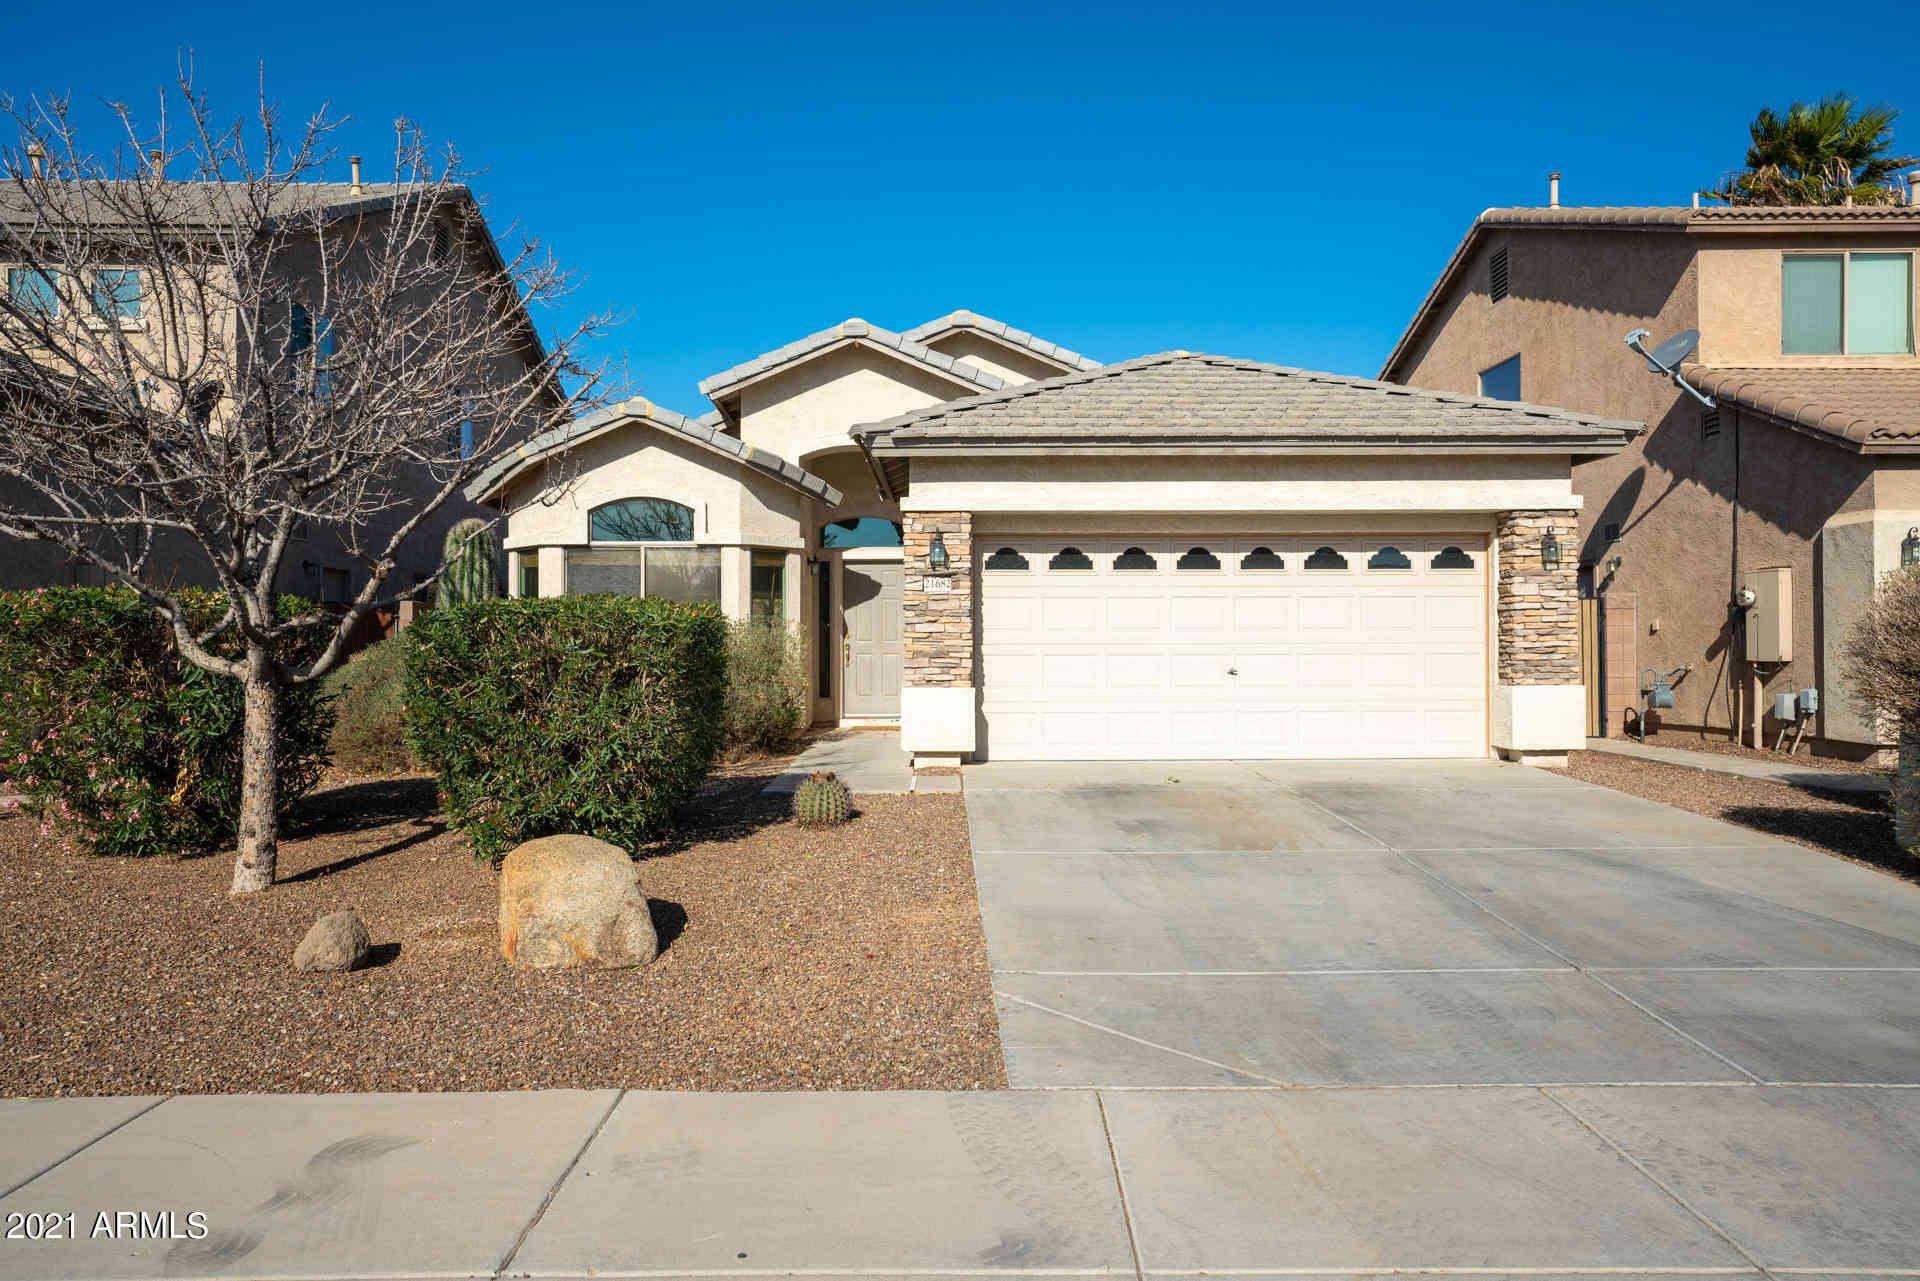 21682 N GREENLAND PARK Drive, Maricopa, AZ, 85139,